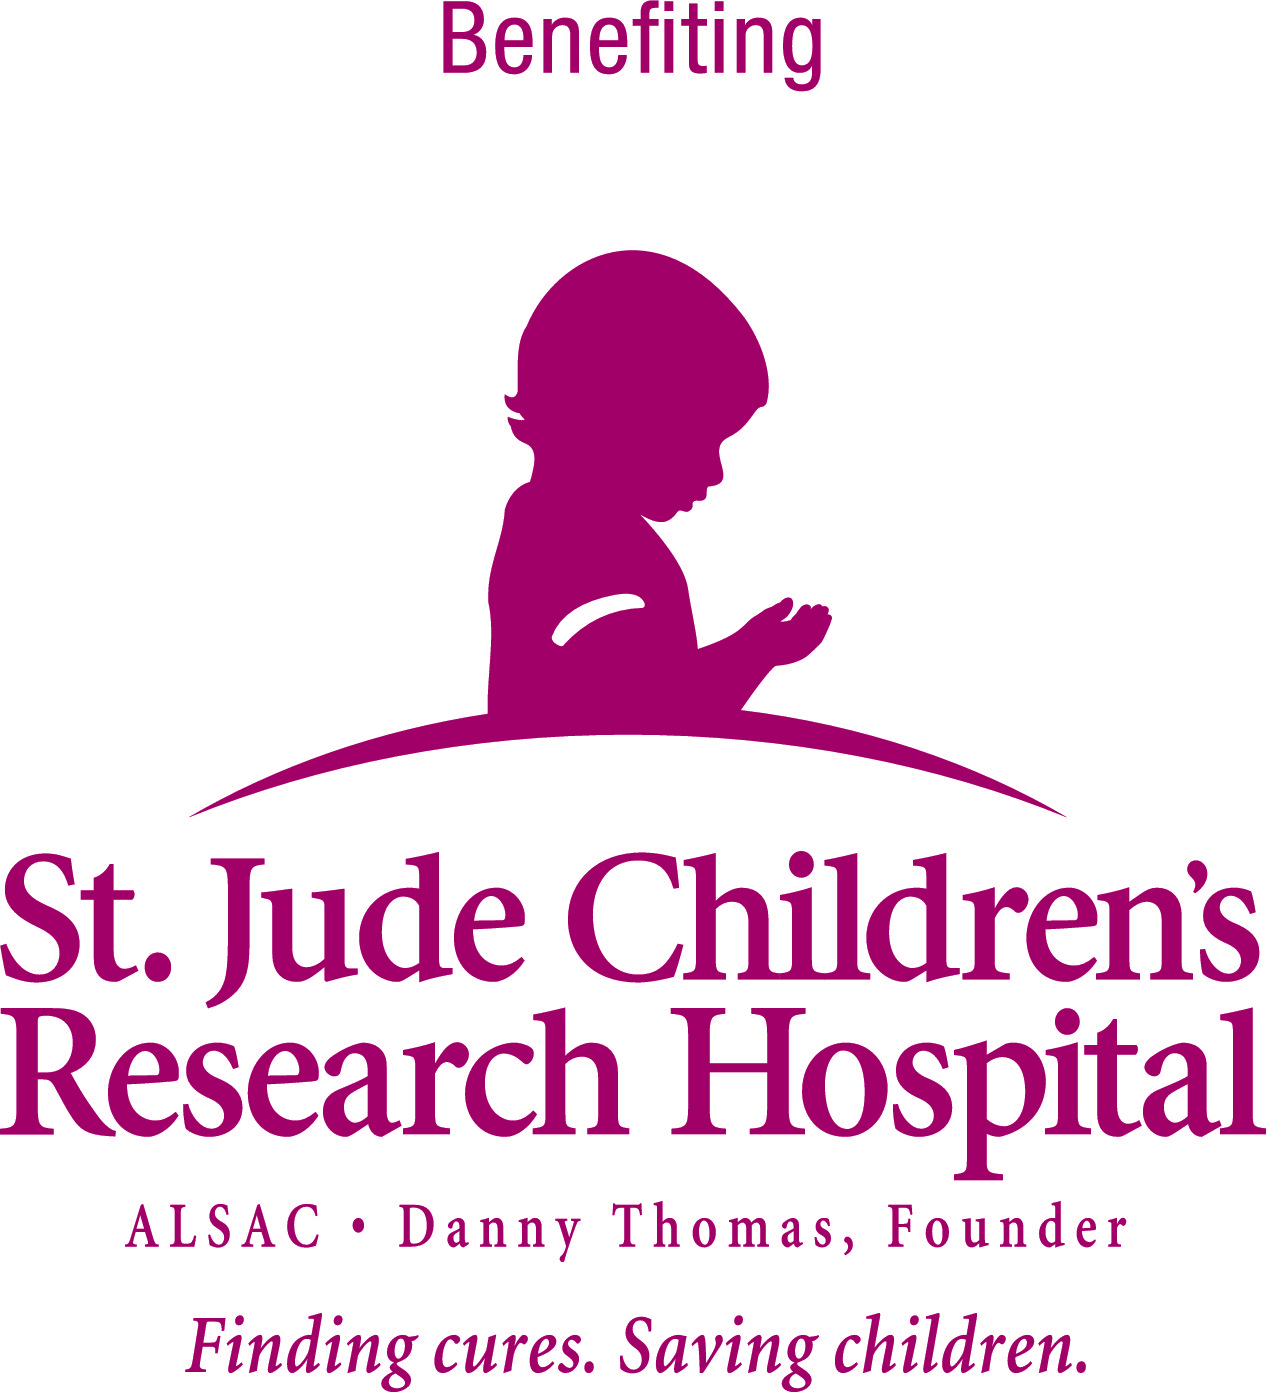 childrens hospital foundation caden - HD1350×1200